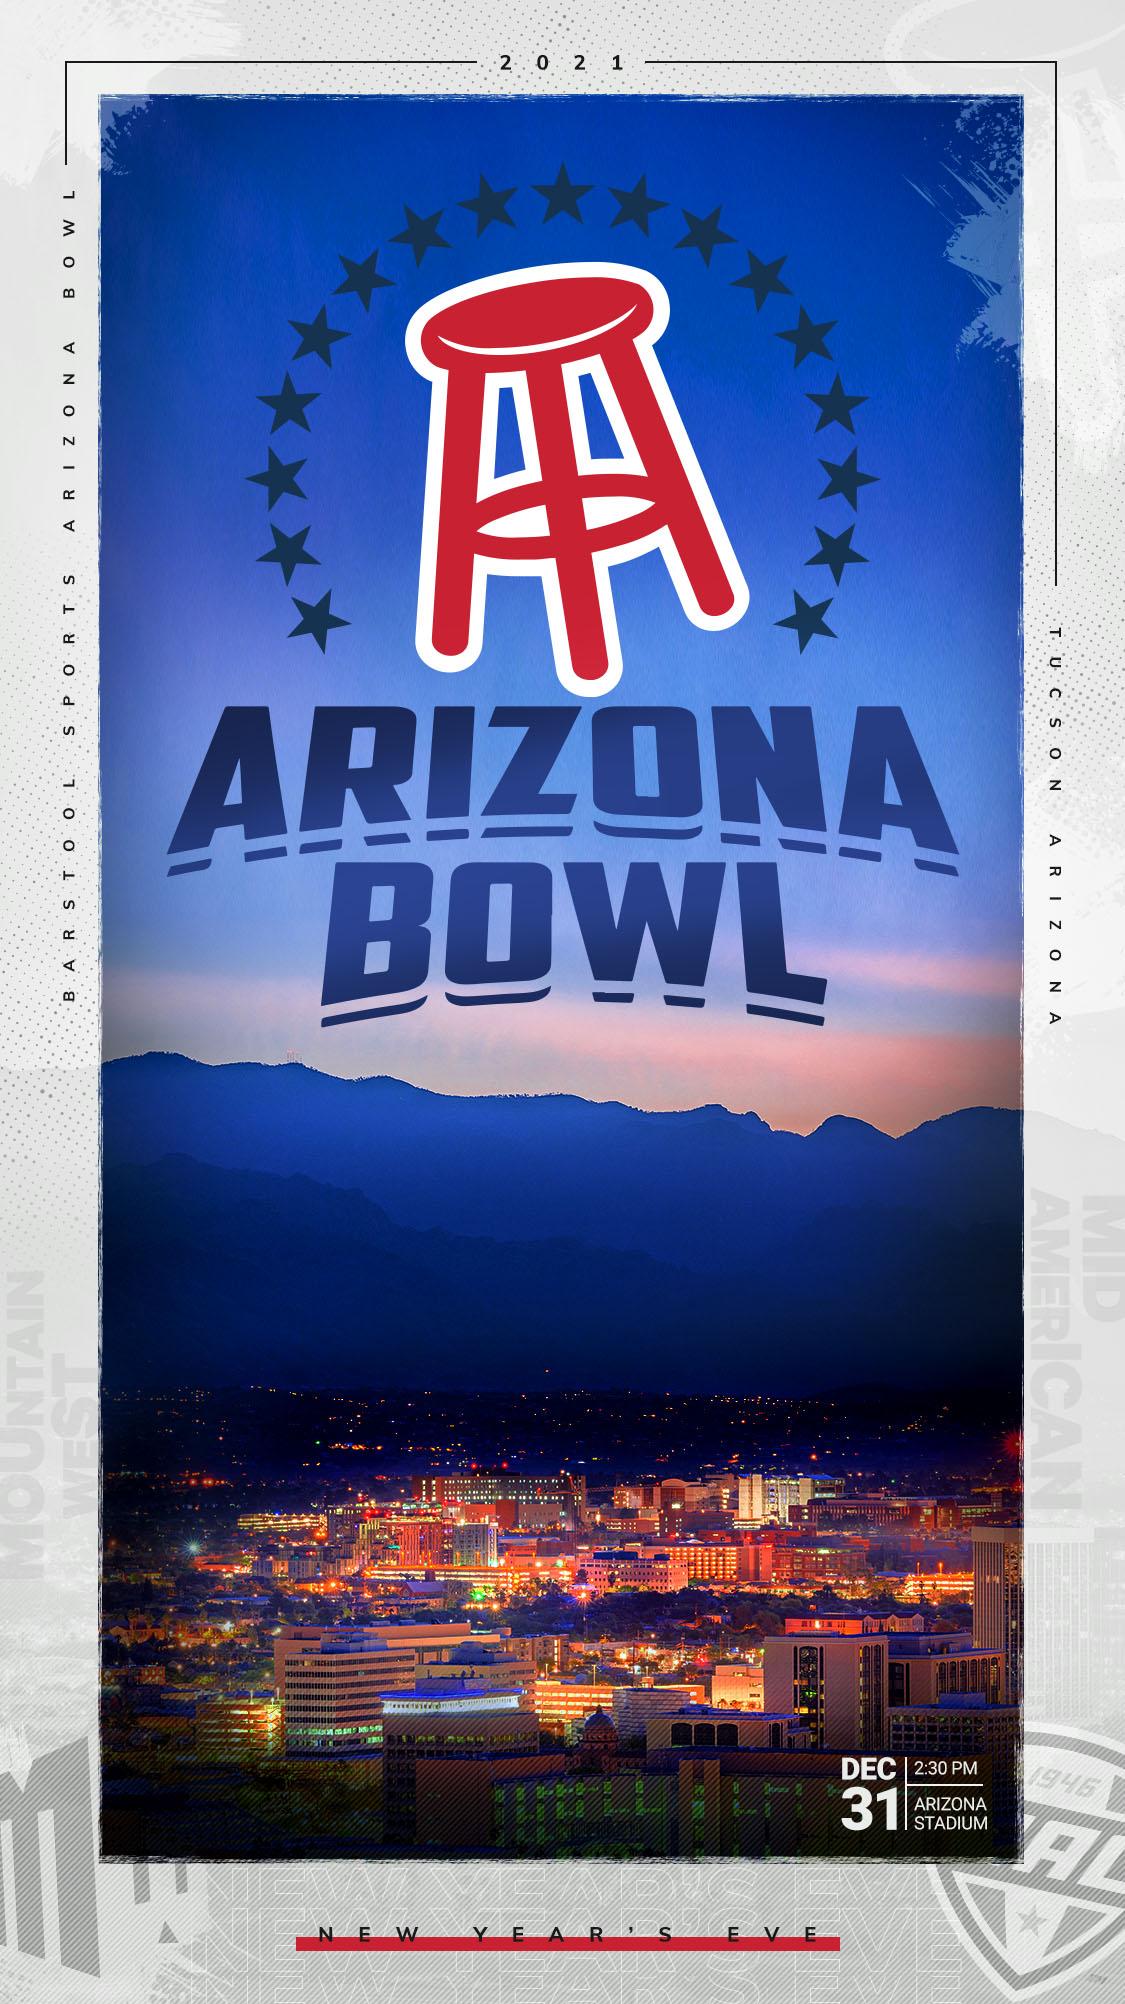 Congrats Ball State Barstool Sports Arizona Bowl Champions Image